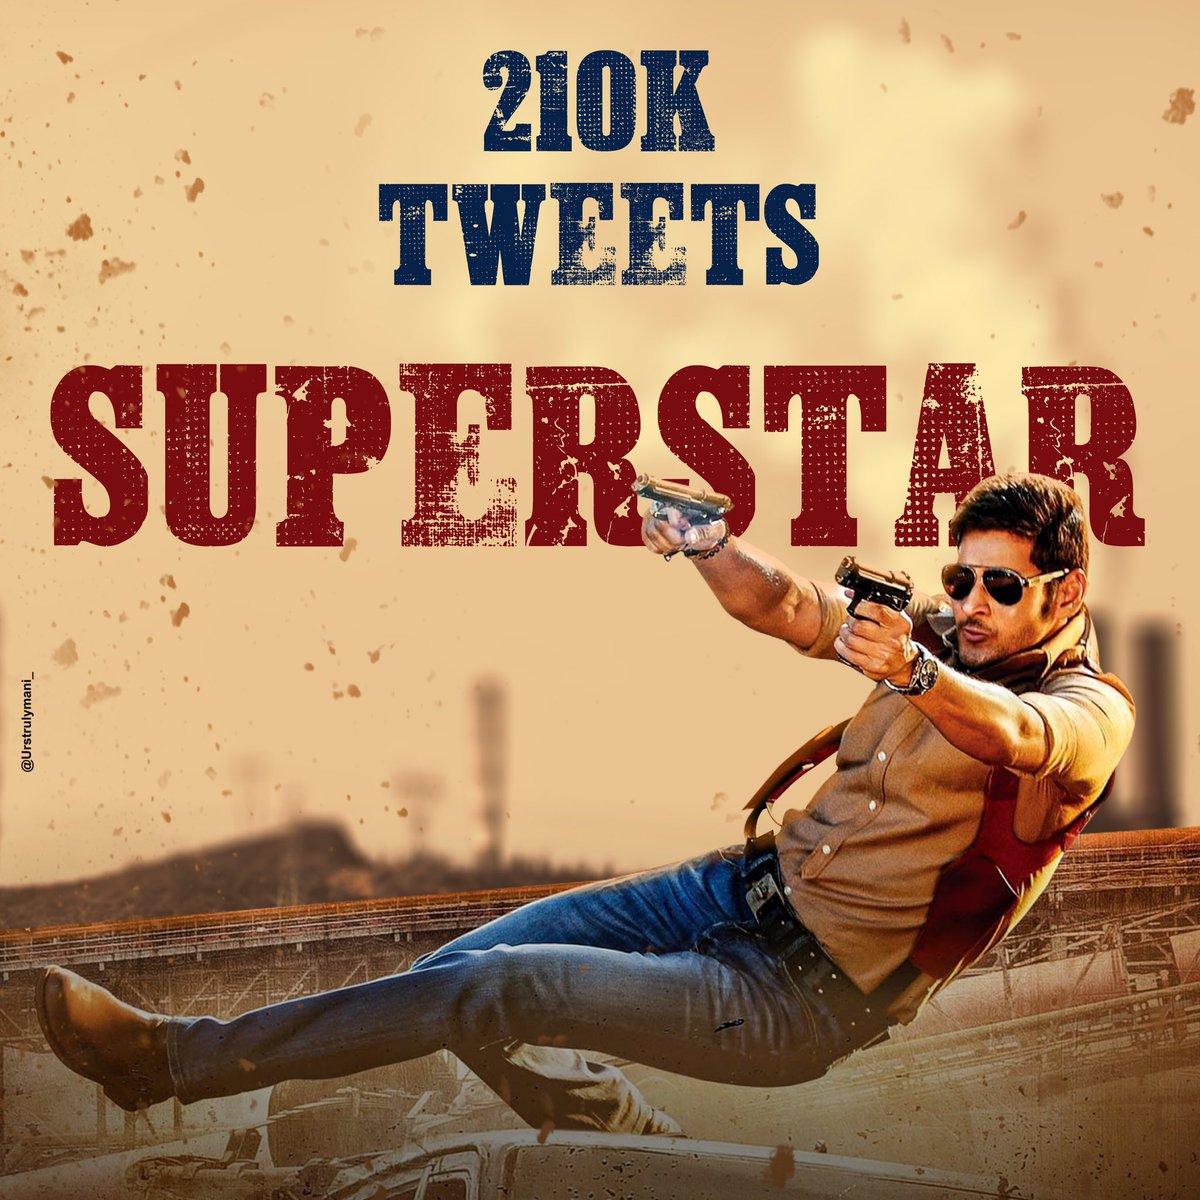 #210K Tweets In 24Hrs   Well Done Superstar Fans   #SarileruNeekevvaru #SSMBReignBeginsSOON  #MaSSMB @urstrulyMahesh<br>http://pic.twitter.com/7loAPurS8G